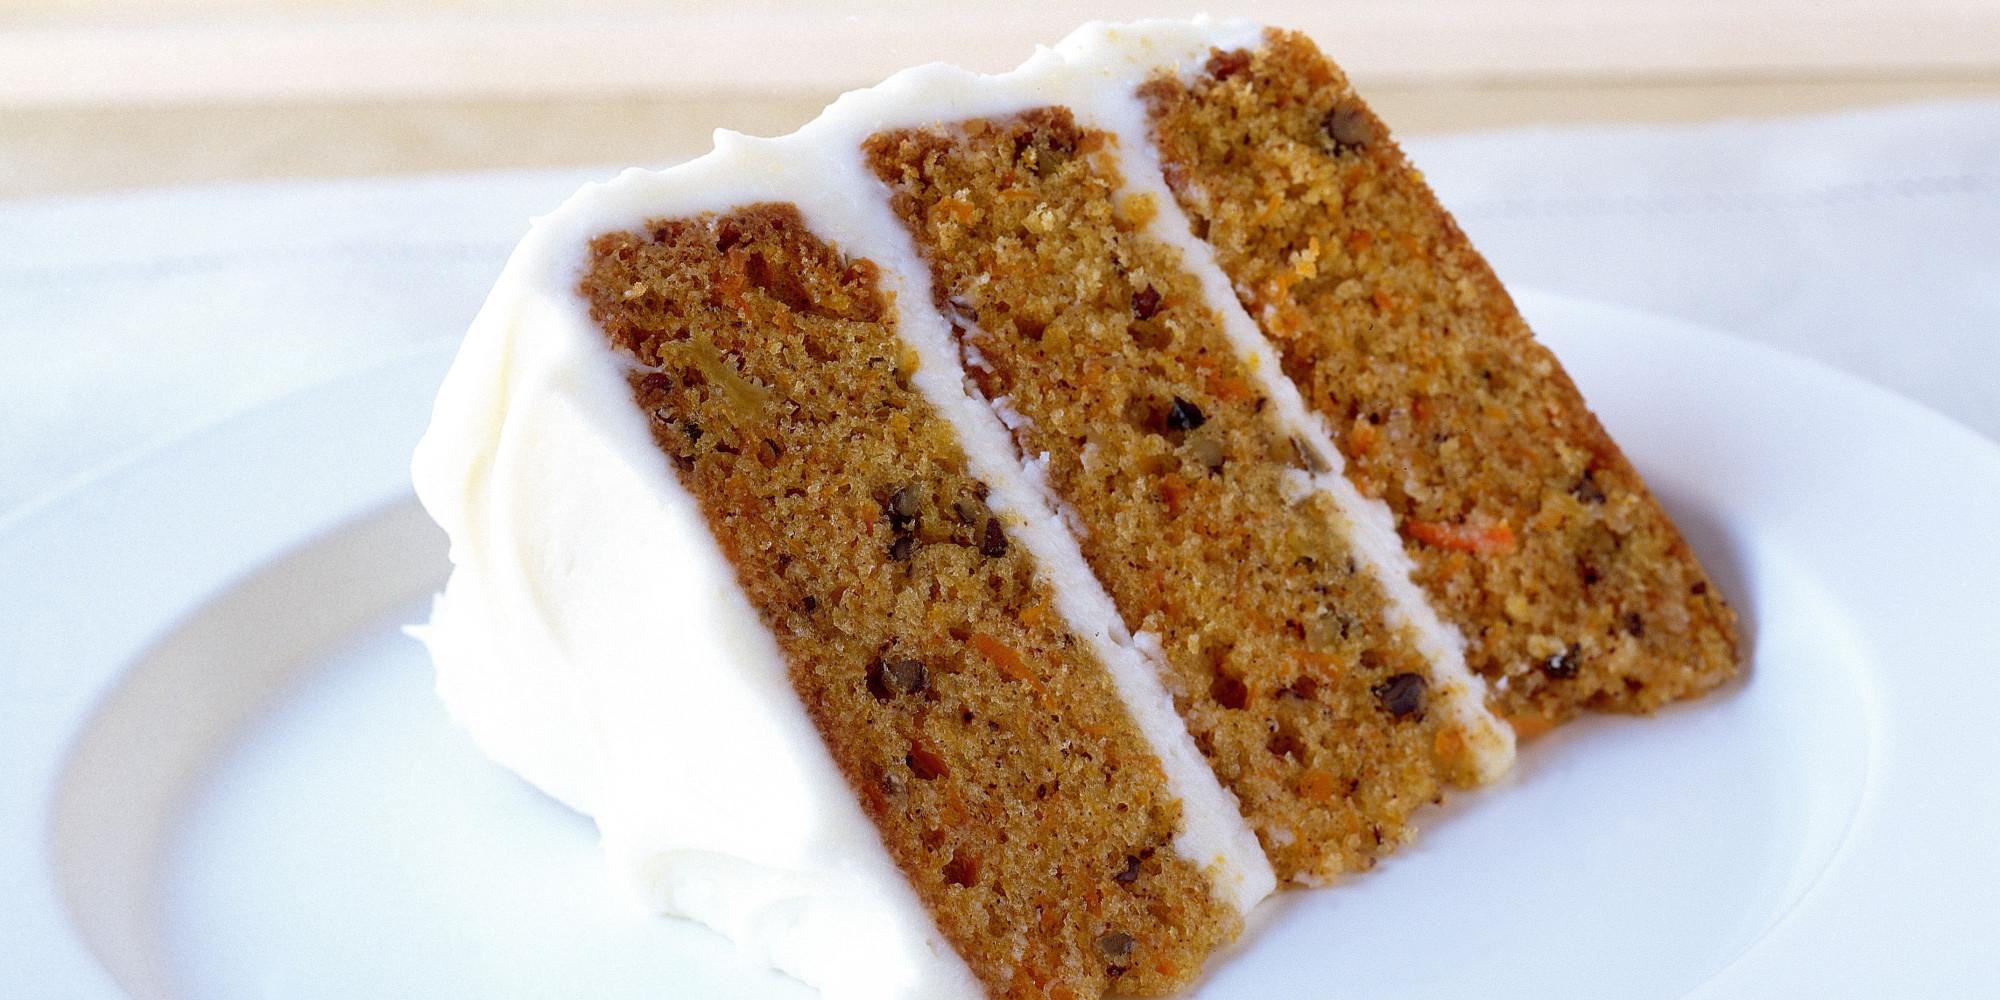 Smitten kitchen cake recipes - Food pasta recipes